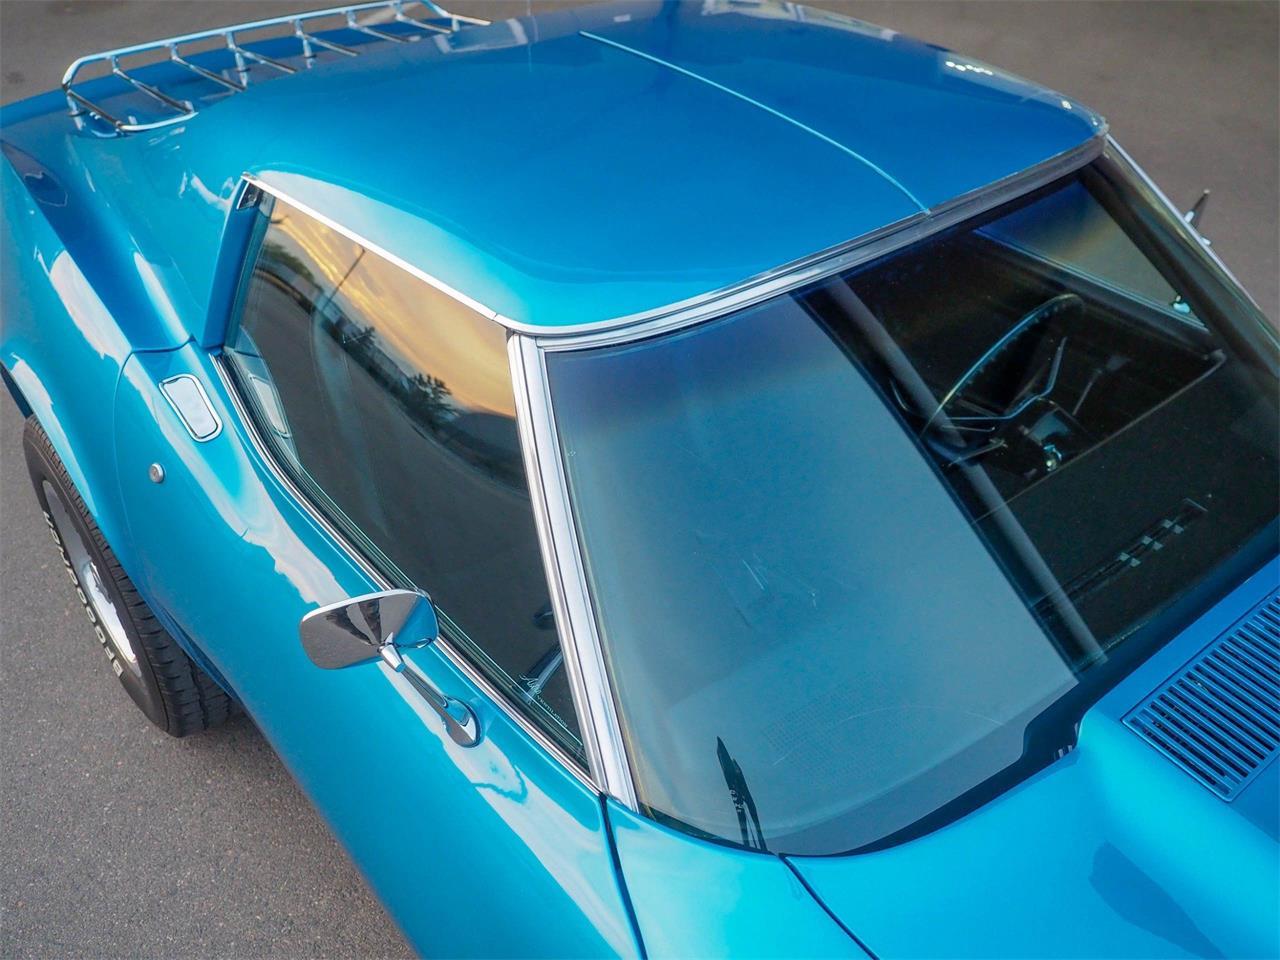 1973 Chevrolet Corvette (CC-1412499) for sale in Englewood, Colorado